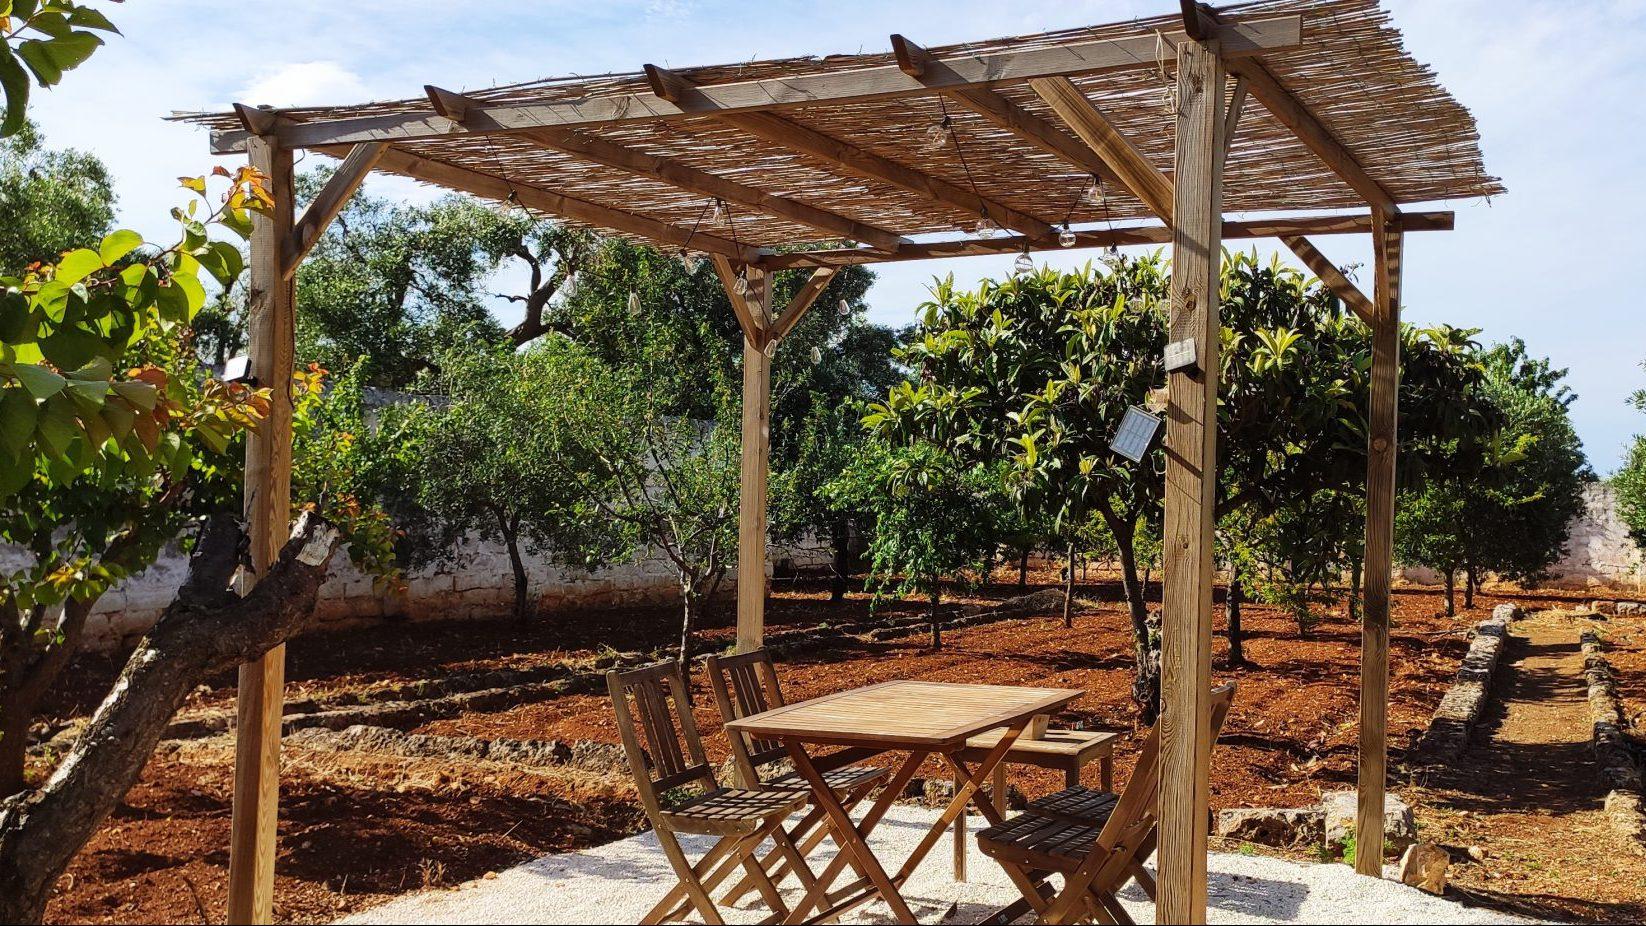 Gazebo in the garden at Masseria Bellavista Ostuni Vacation holiday rental villa in Puglia with pool and seaview